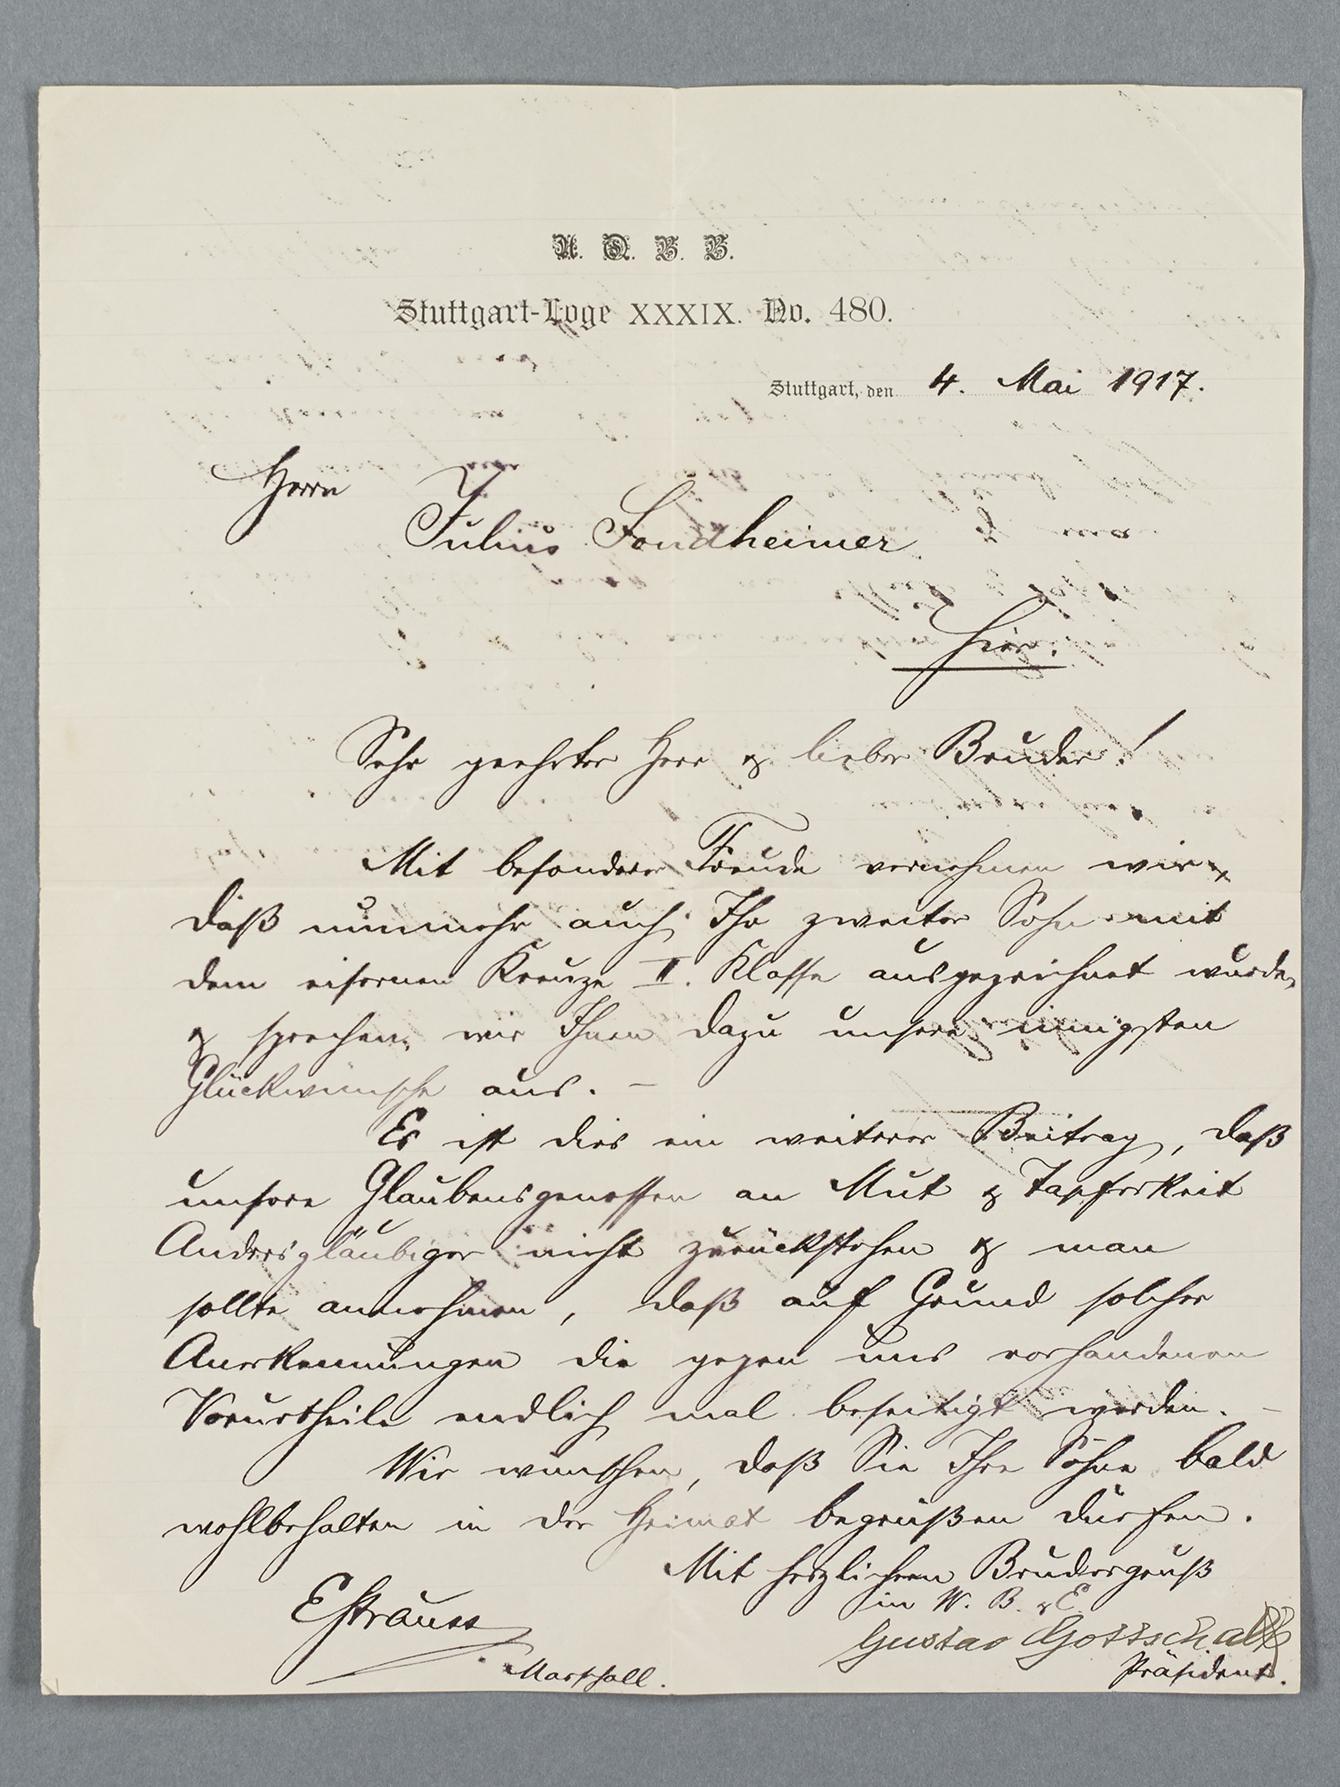 Letter to Julius Sondheimer in old German handwriting